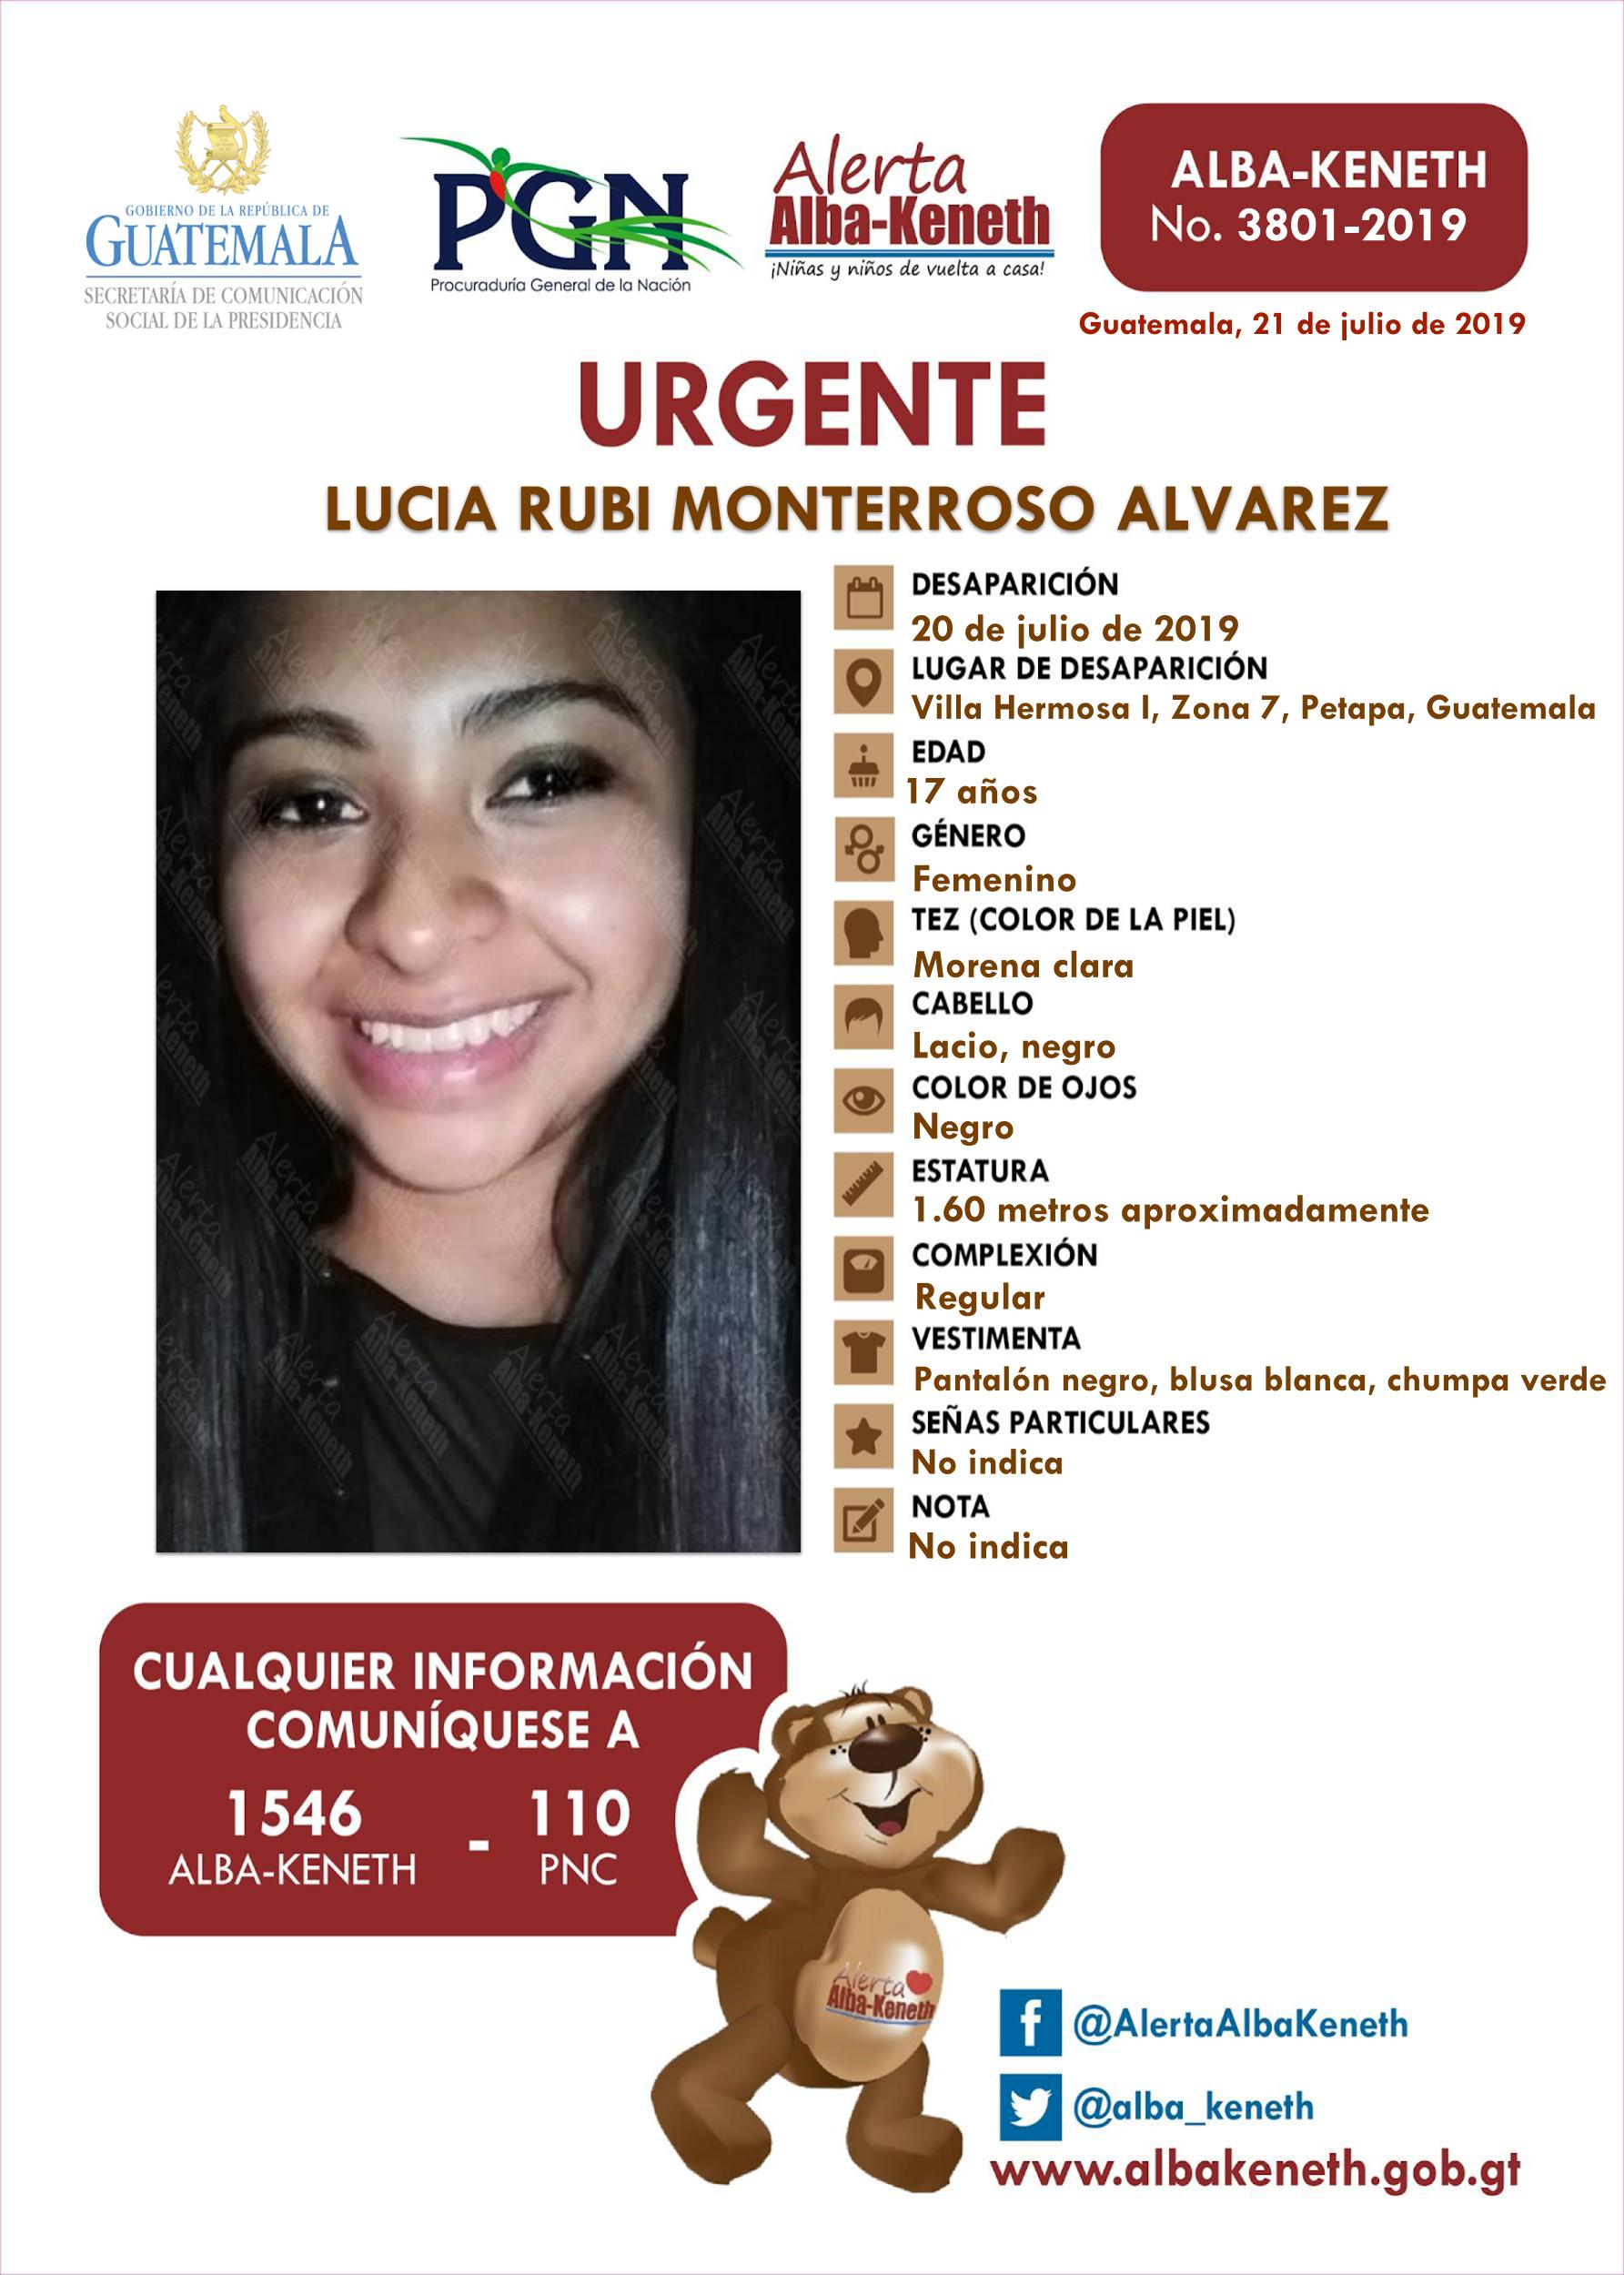 Lucia Rubi Monterroso Alvarez